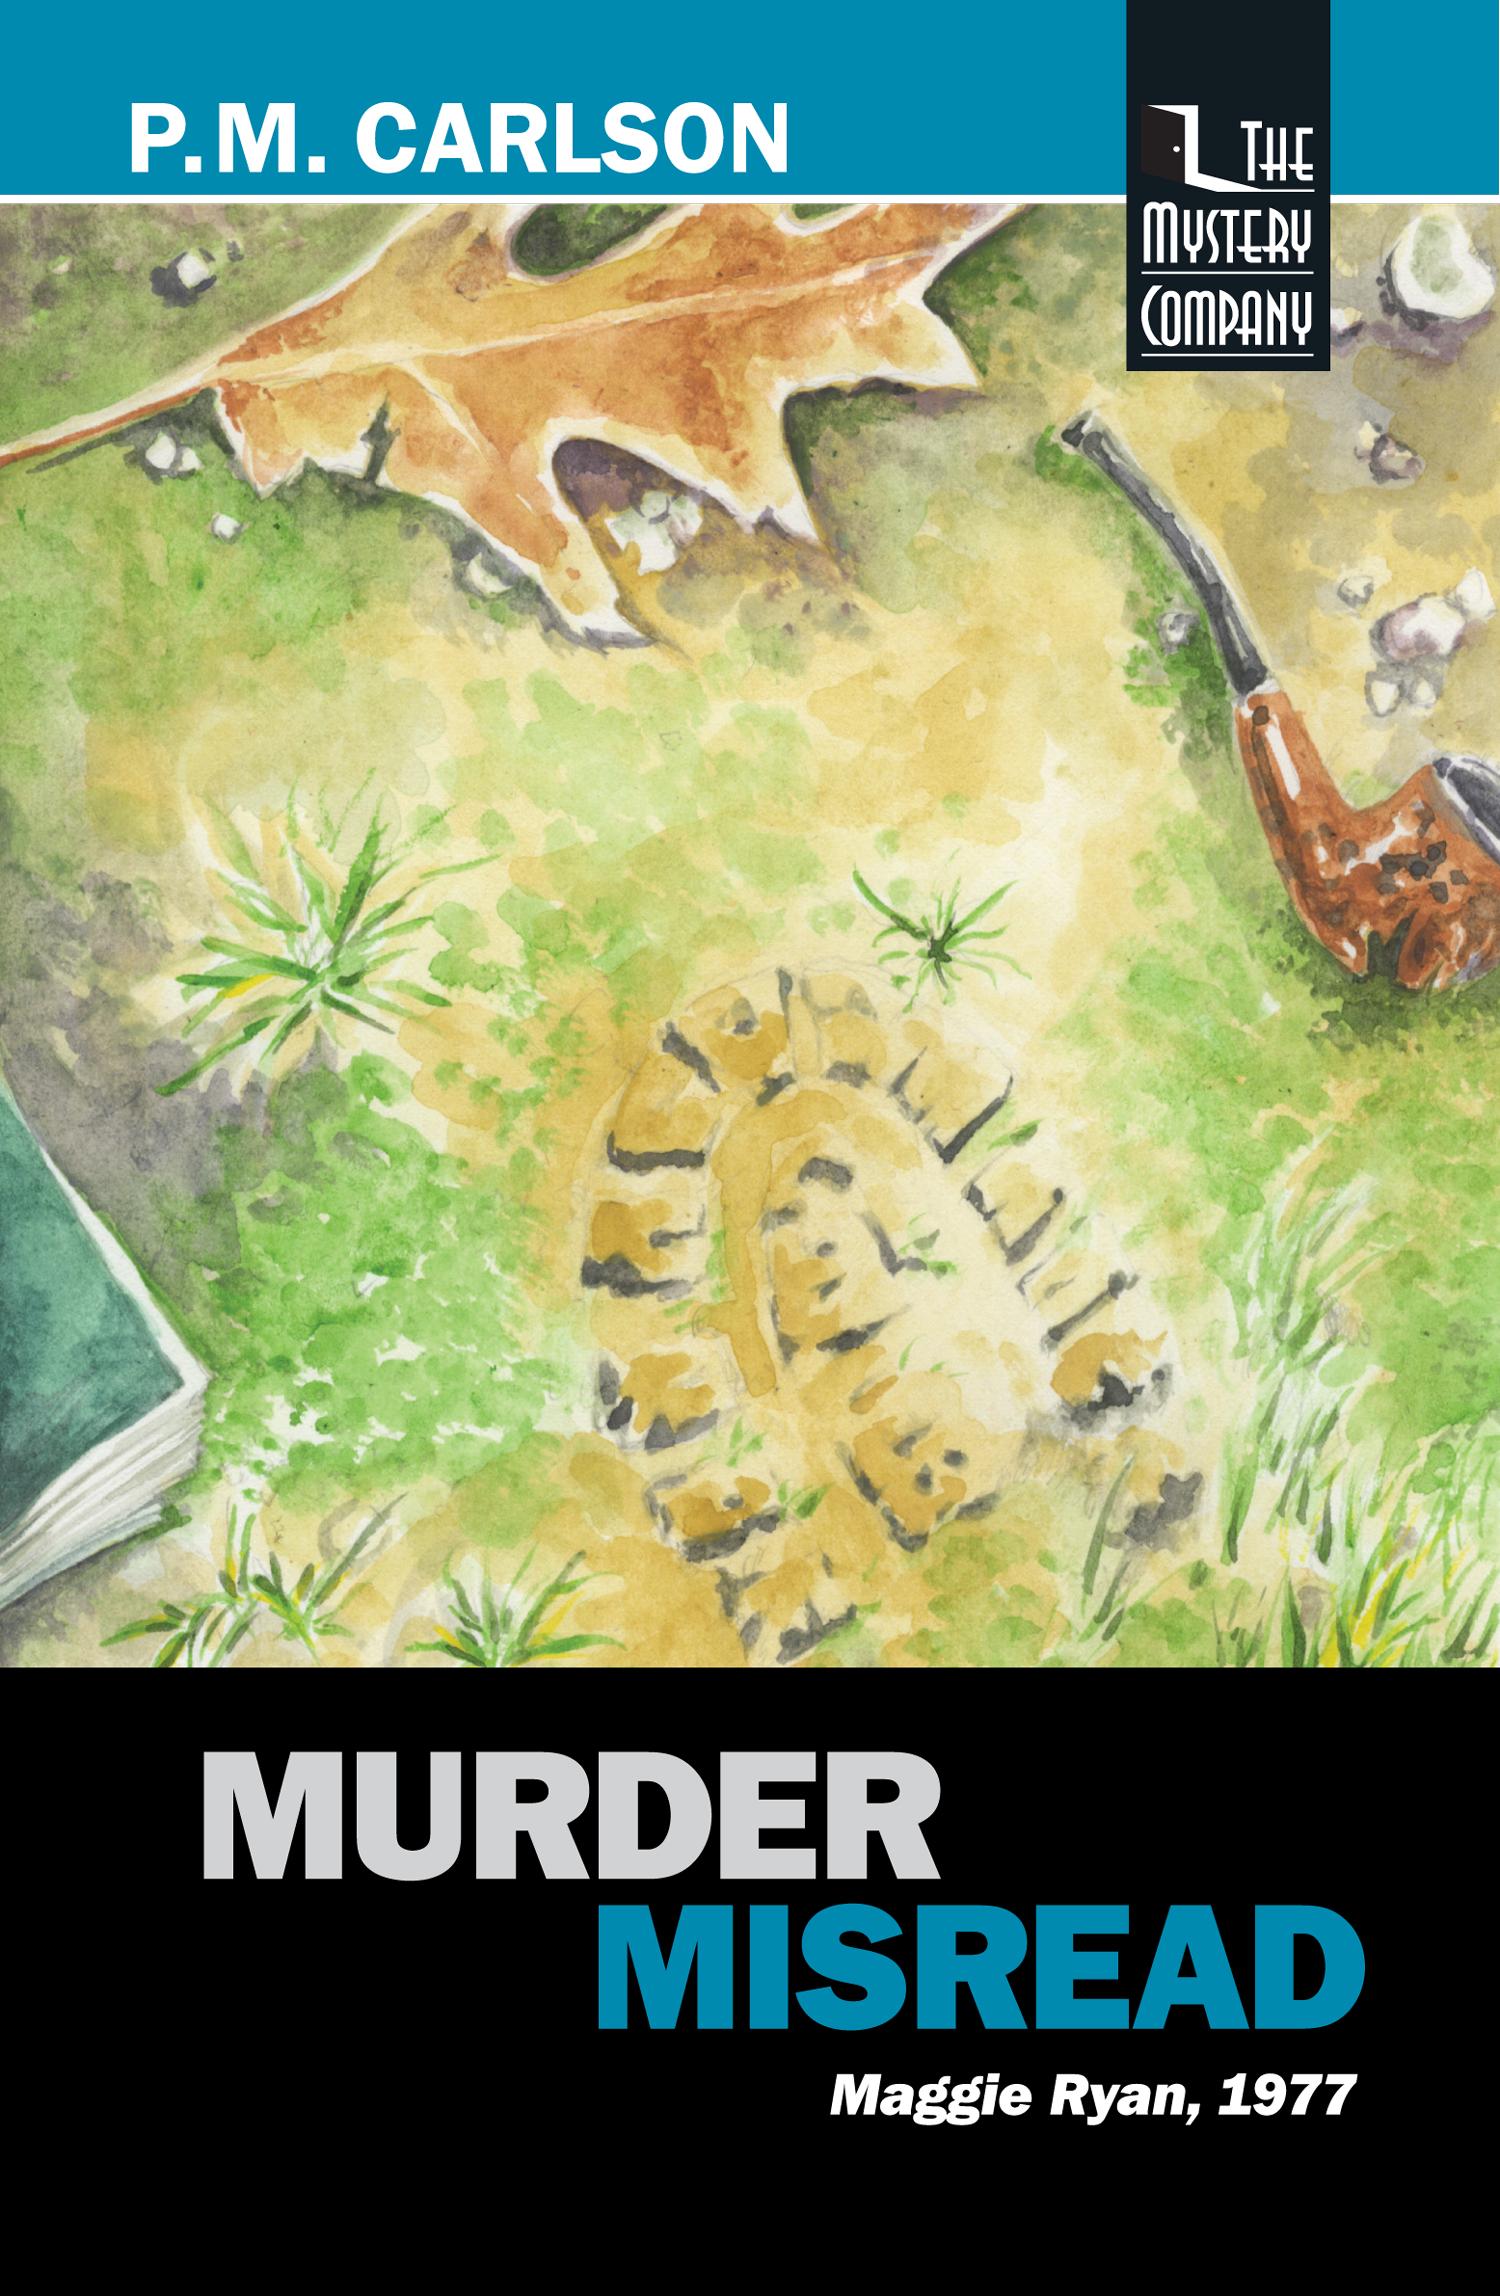 Murder Misread by P.M. Carlson